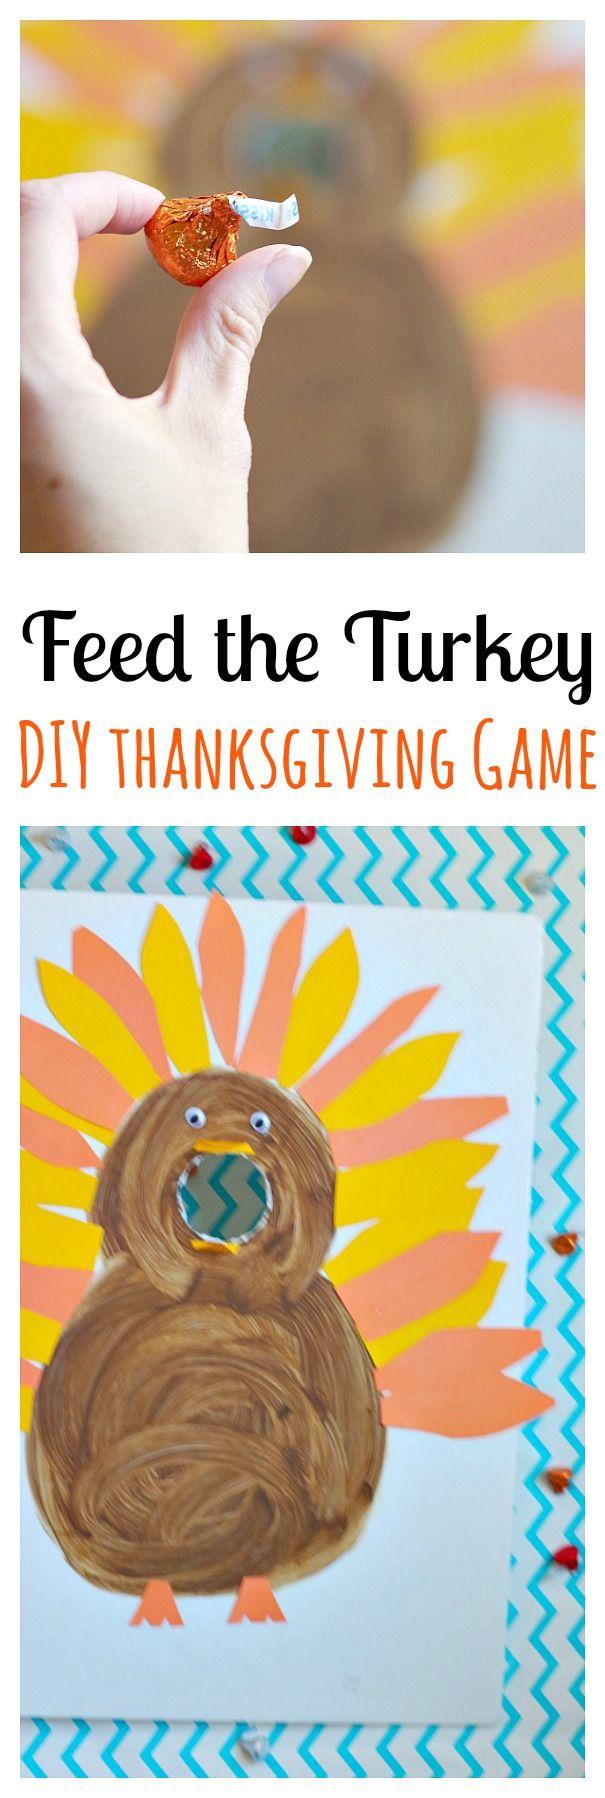 Feed the Turkey DIY Thanksgiving Game